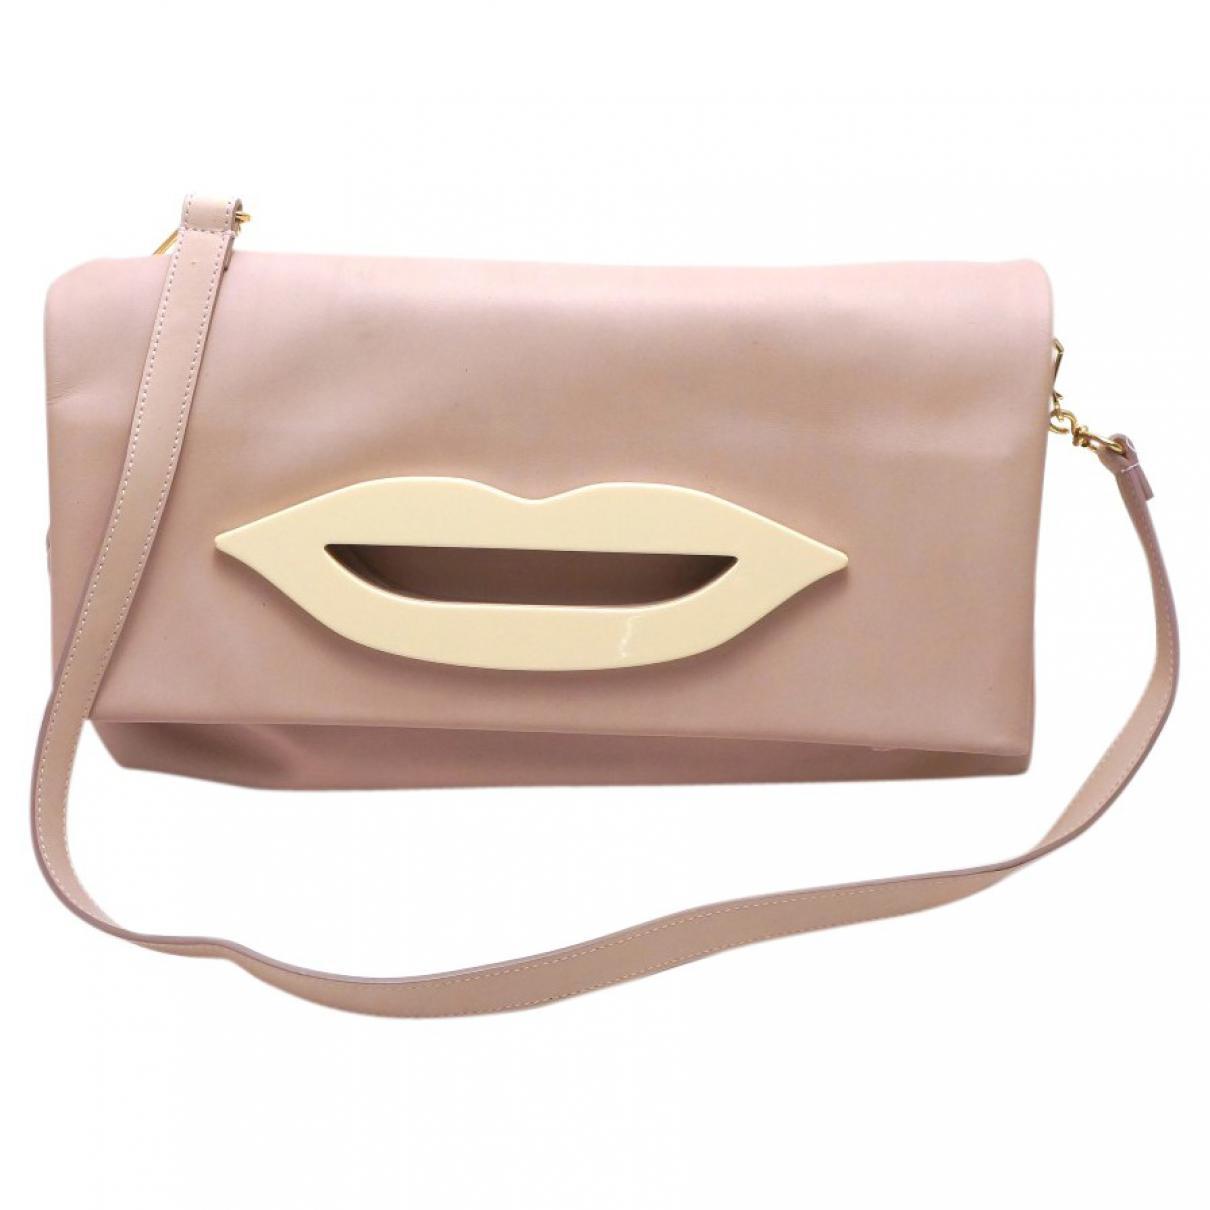 Pre-owned - Wool handbag Sonia Rykiel Caz81Z